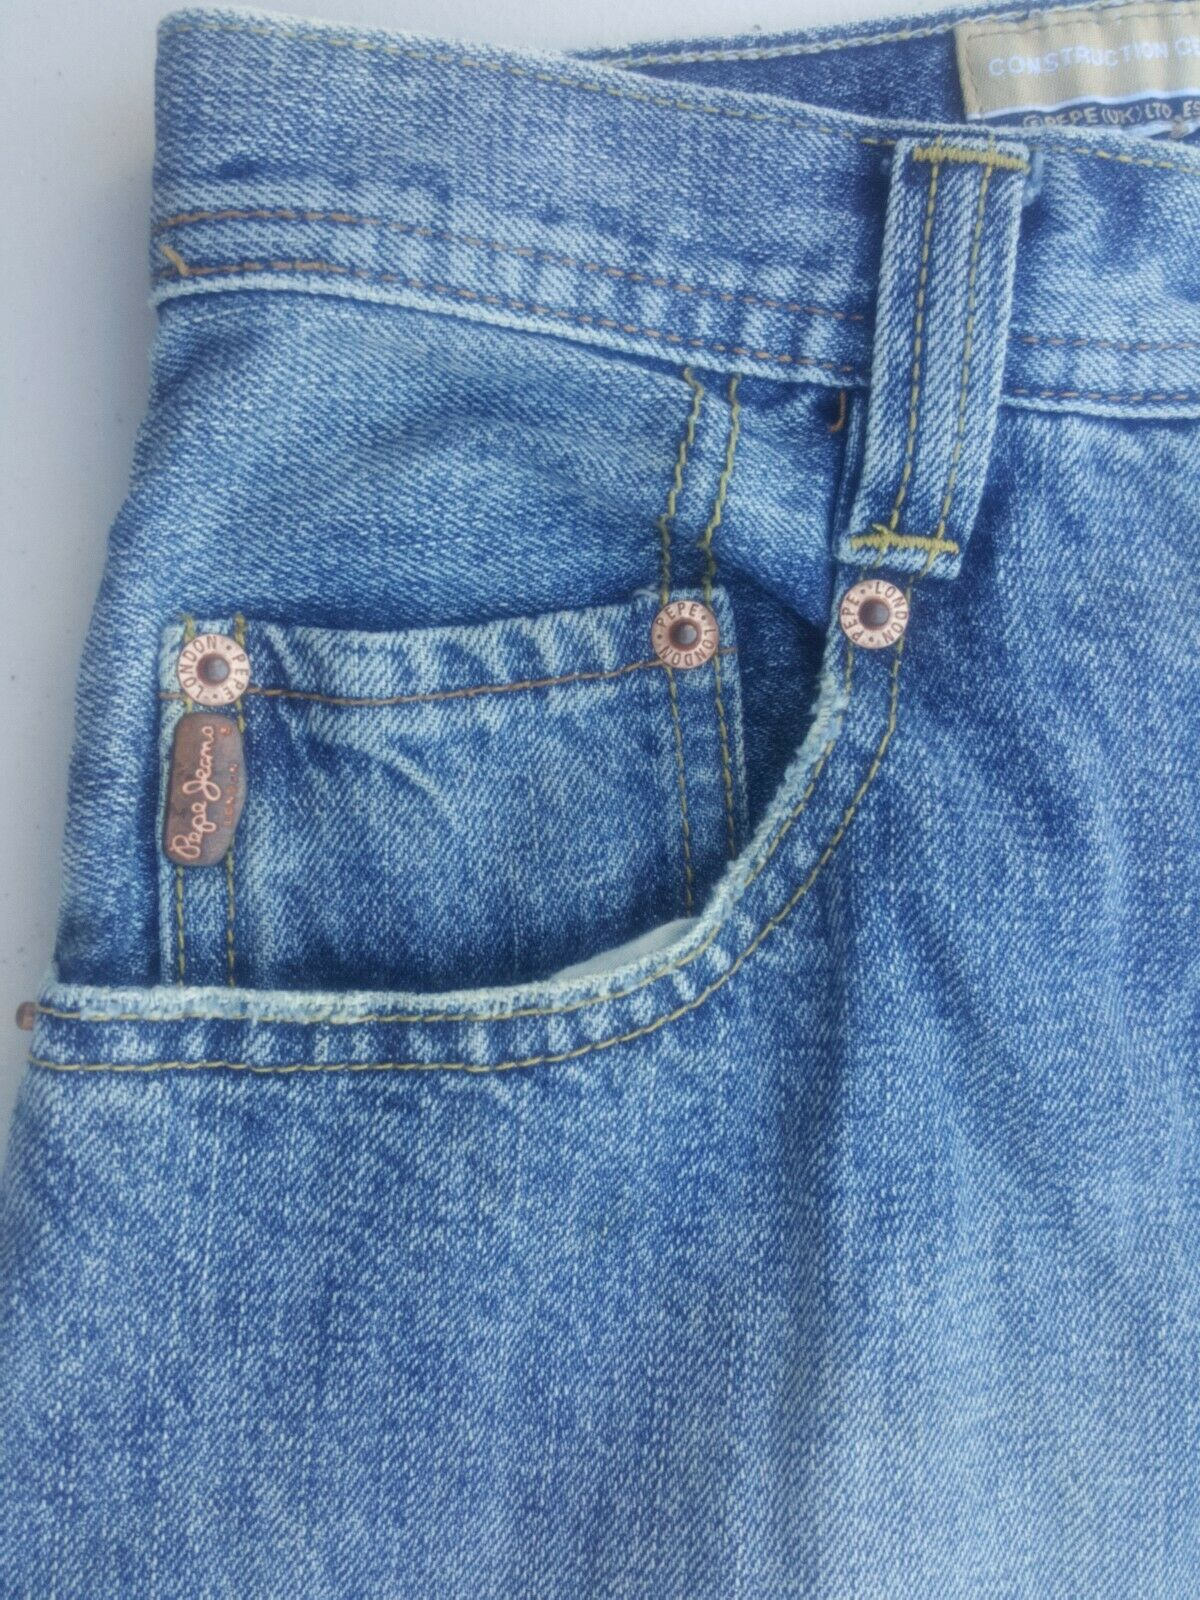 PEPE JEANS London Benny Mens/Boys/Youth Size 16 29x29 B15 Lot AA EUC Denim - $12.95